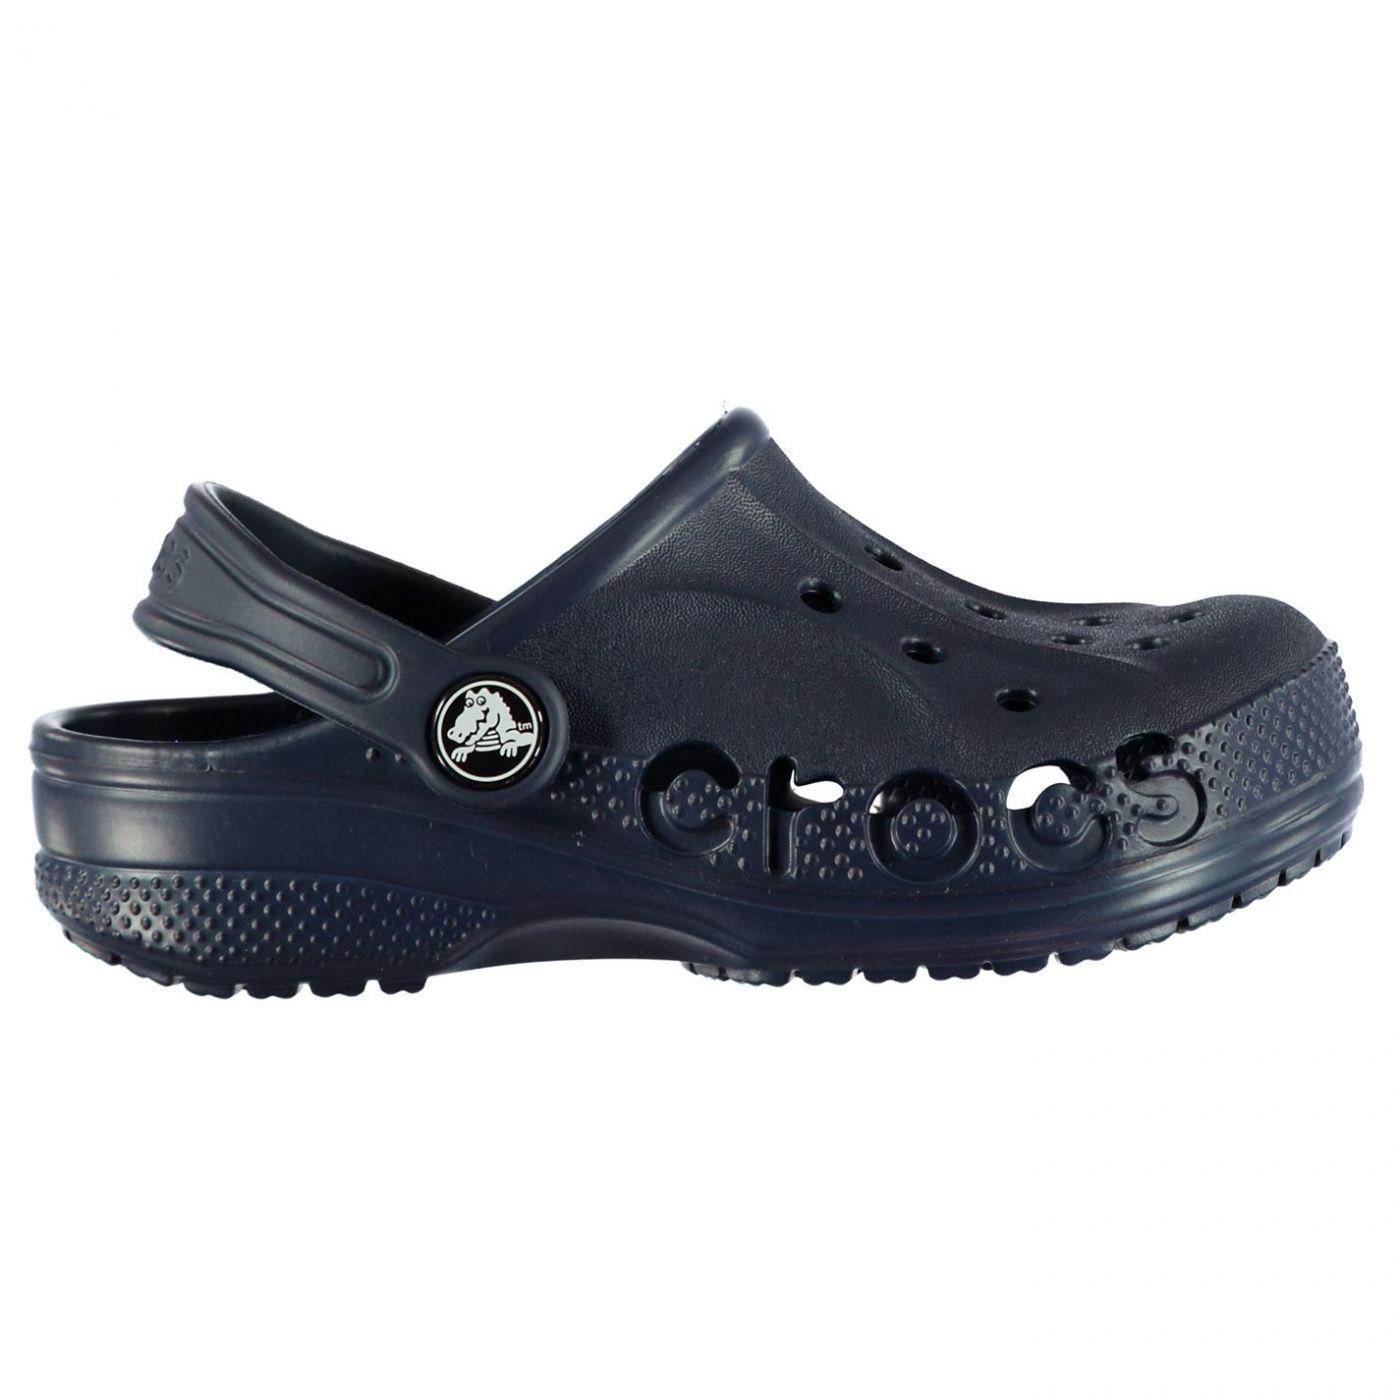 Crocs Baya Childrens Clogs